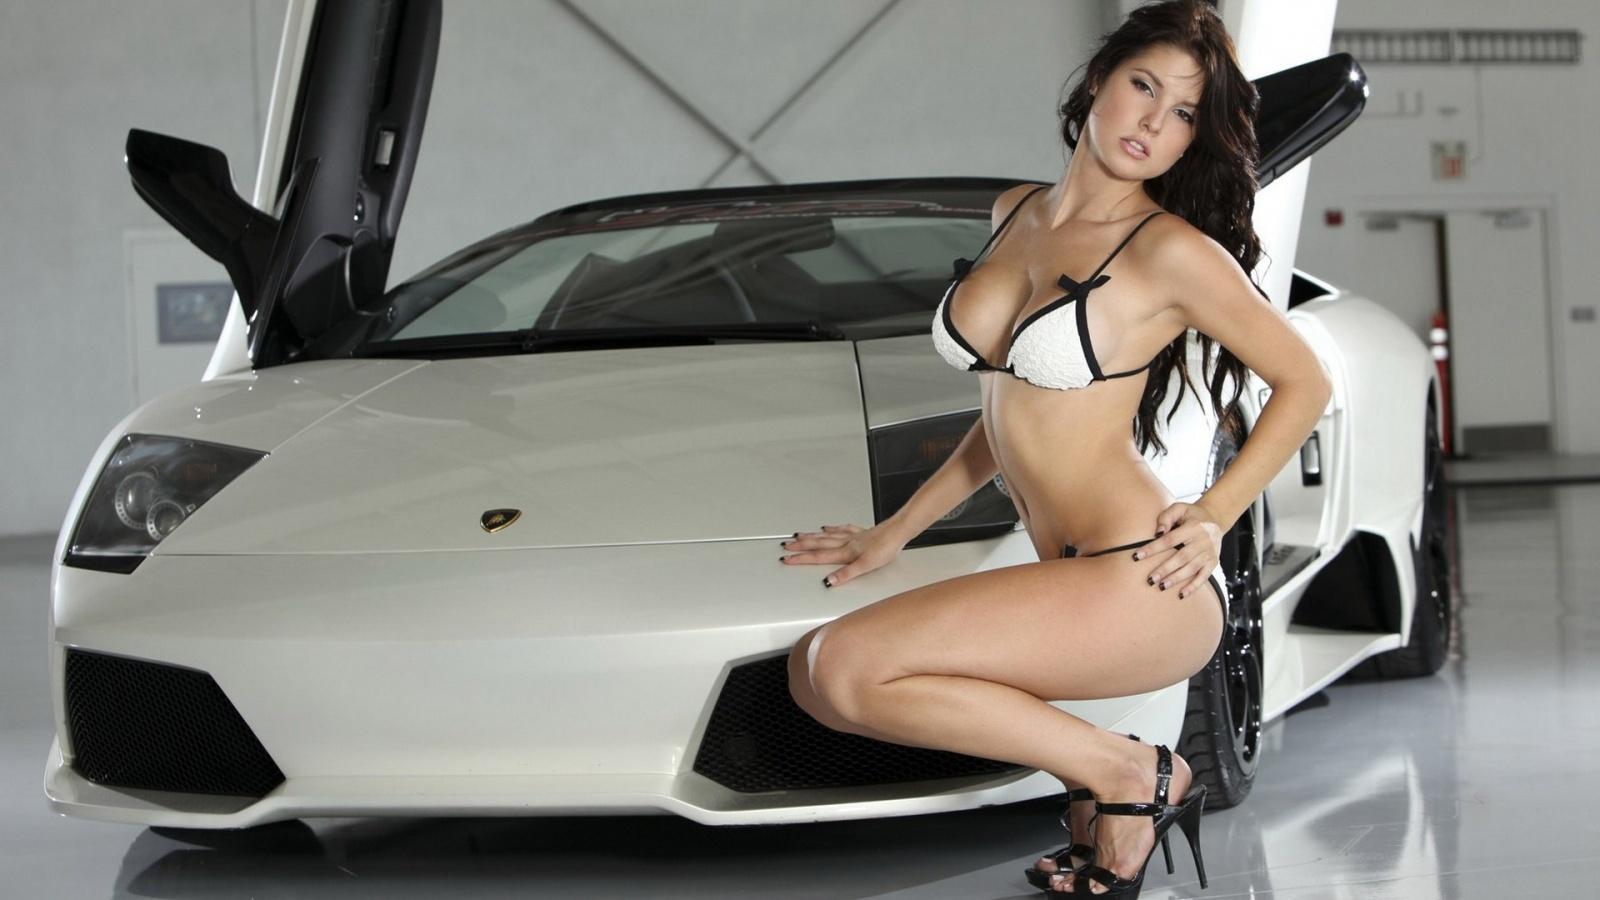 lamborghini gallardo and hot busty babe amanda cerny in bikinis sexy